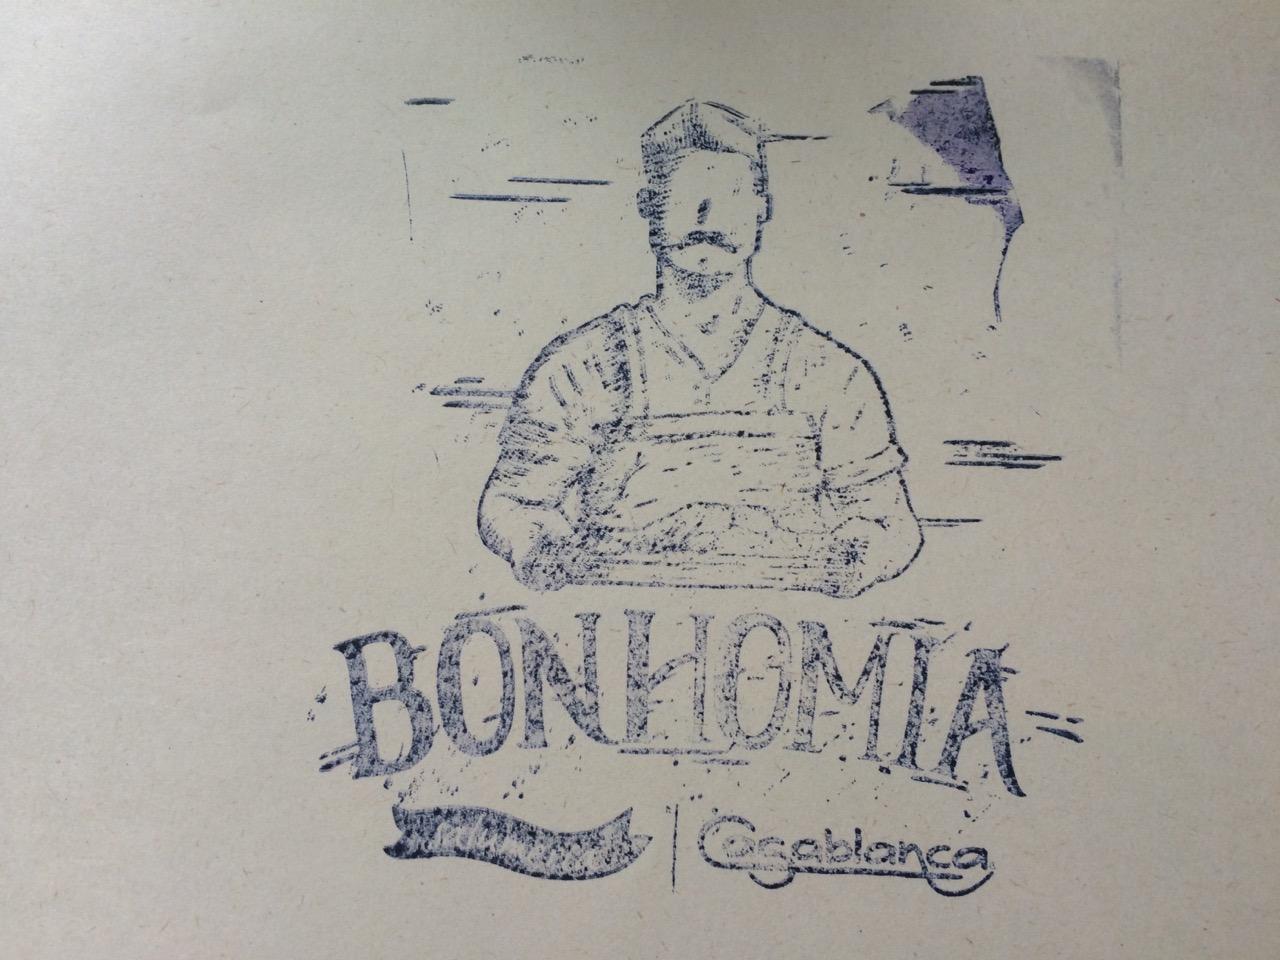 Bonhomia Salumeria